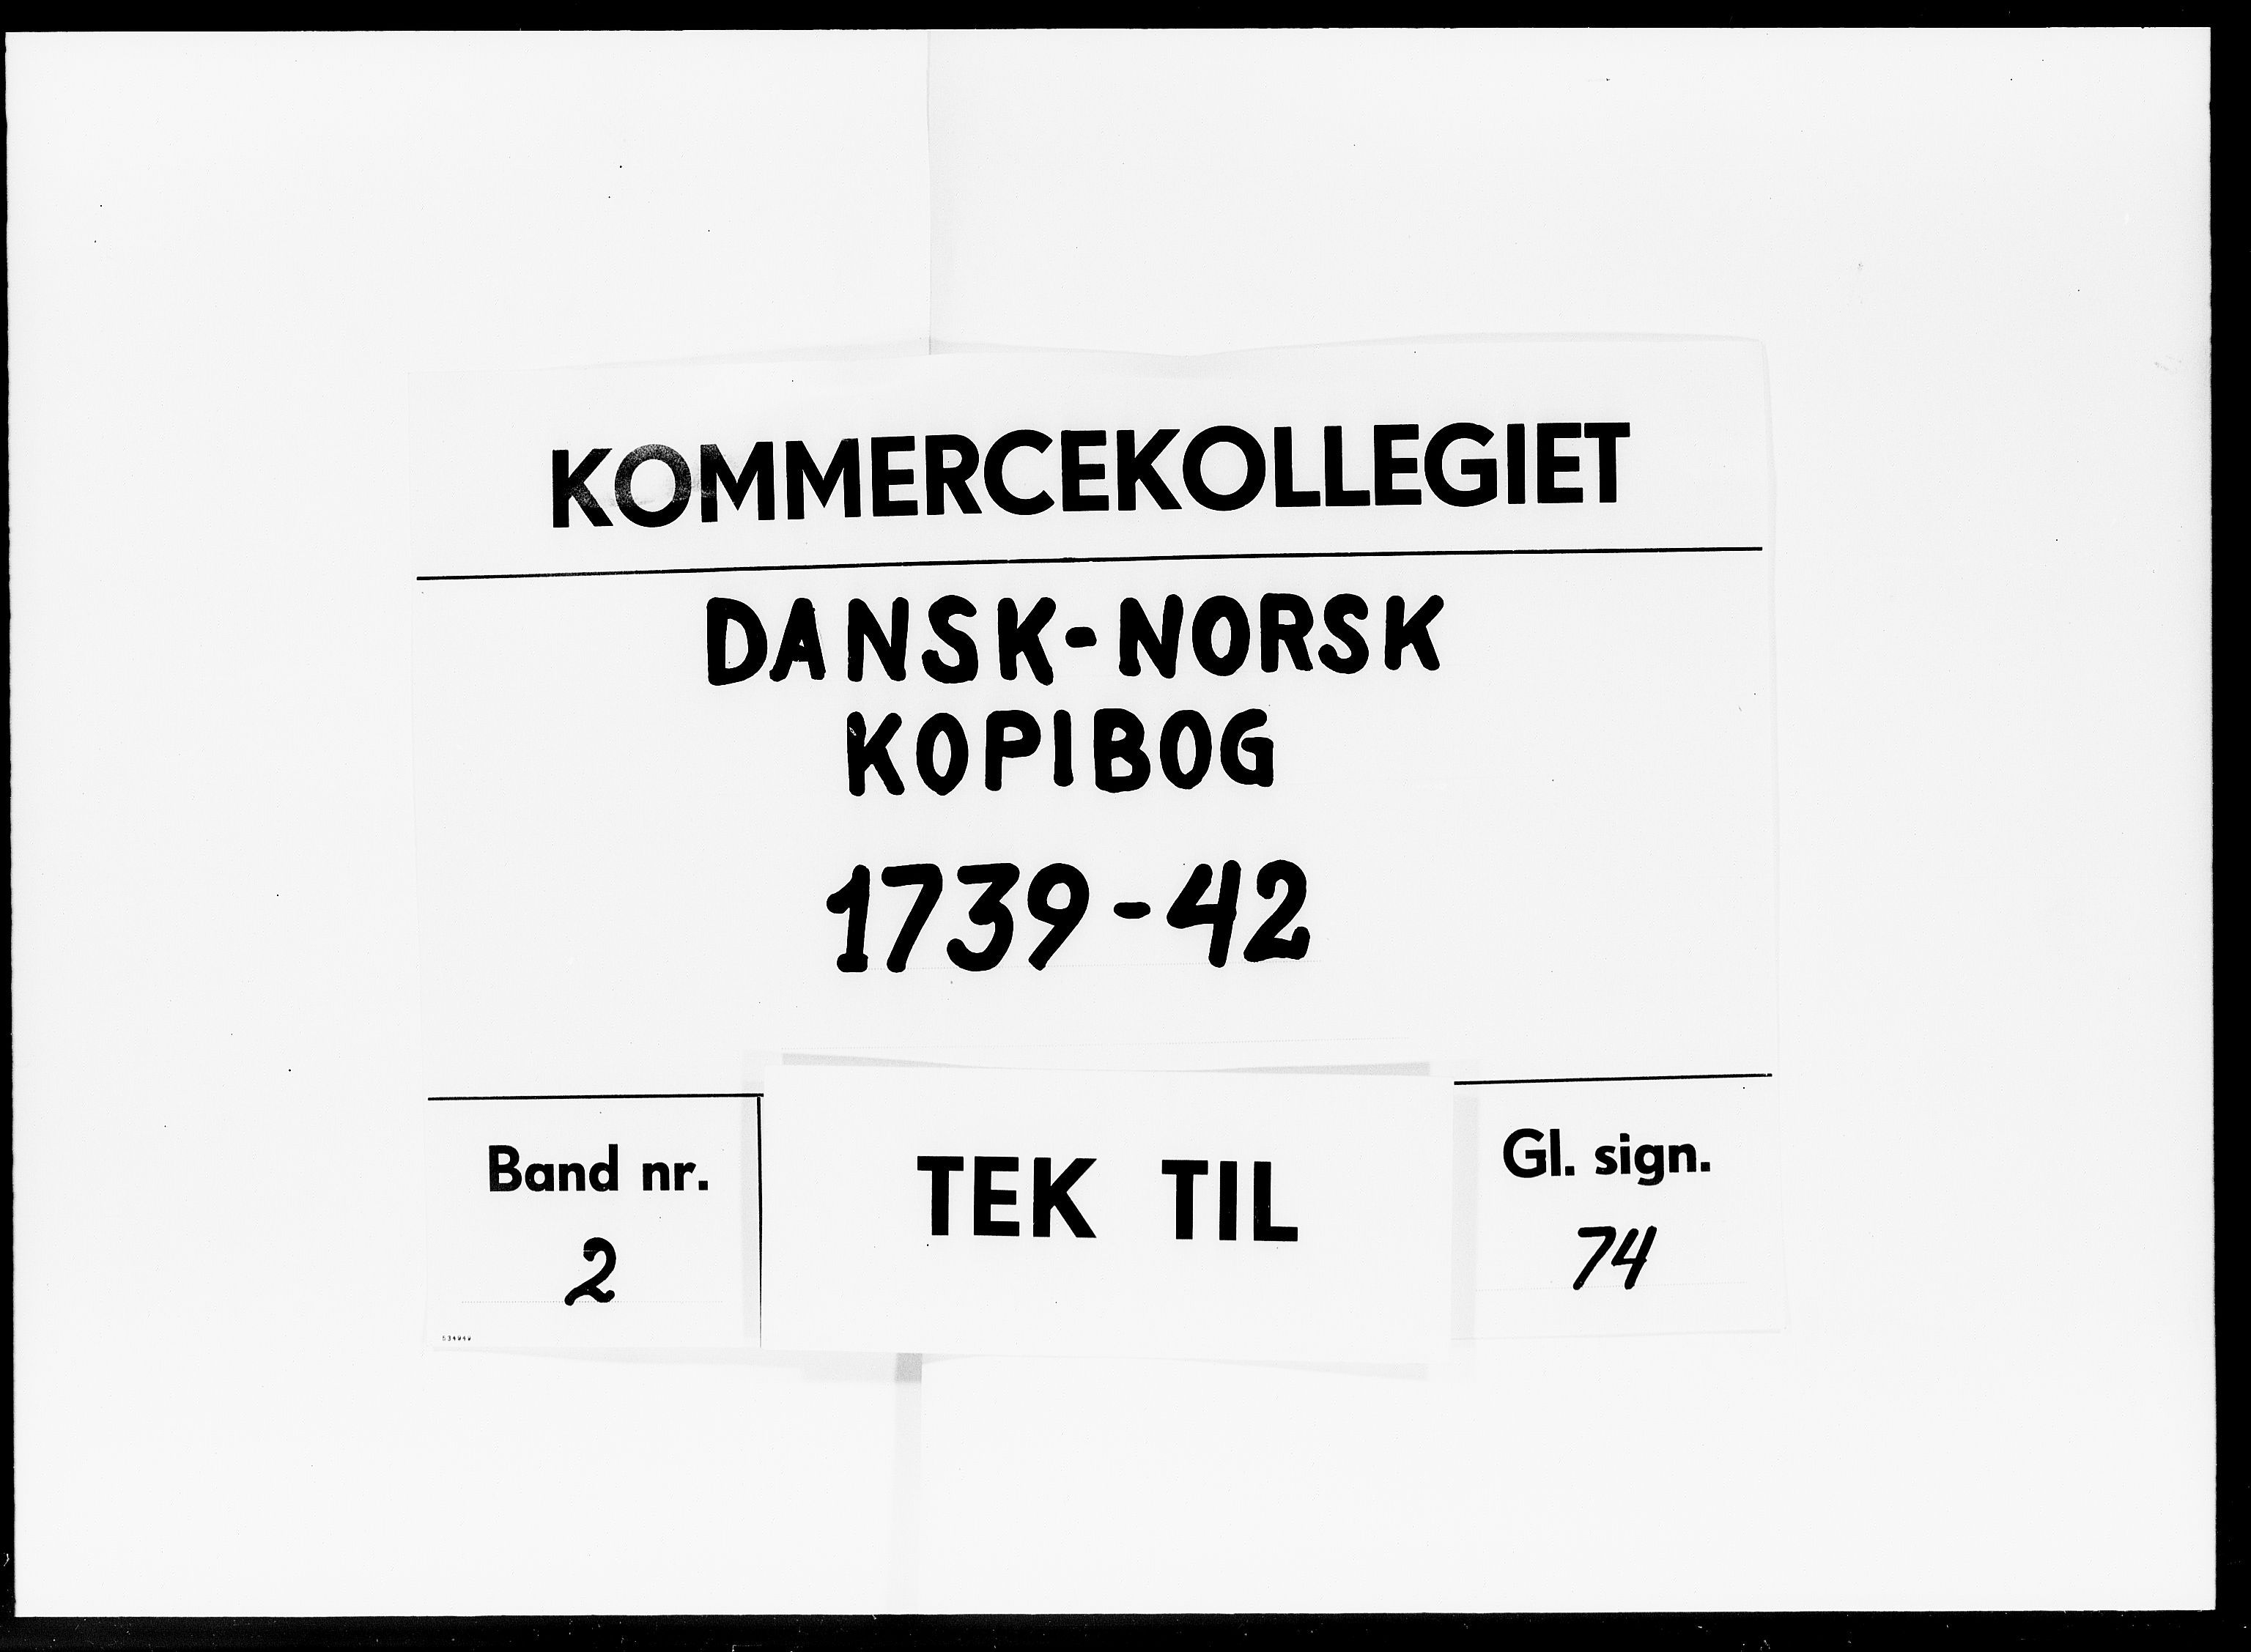 DRA, Kommercekollegiet, Dansk-Norske Sekretariat, -/42: Dansk-Norsk kopibog, 1739-1742